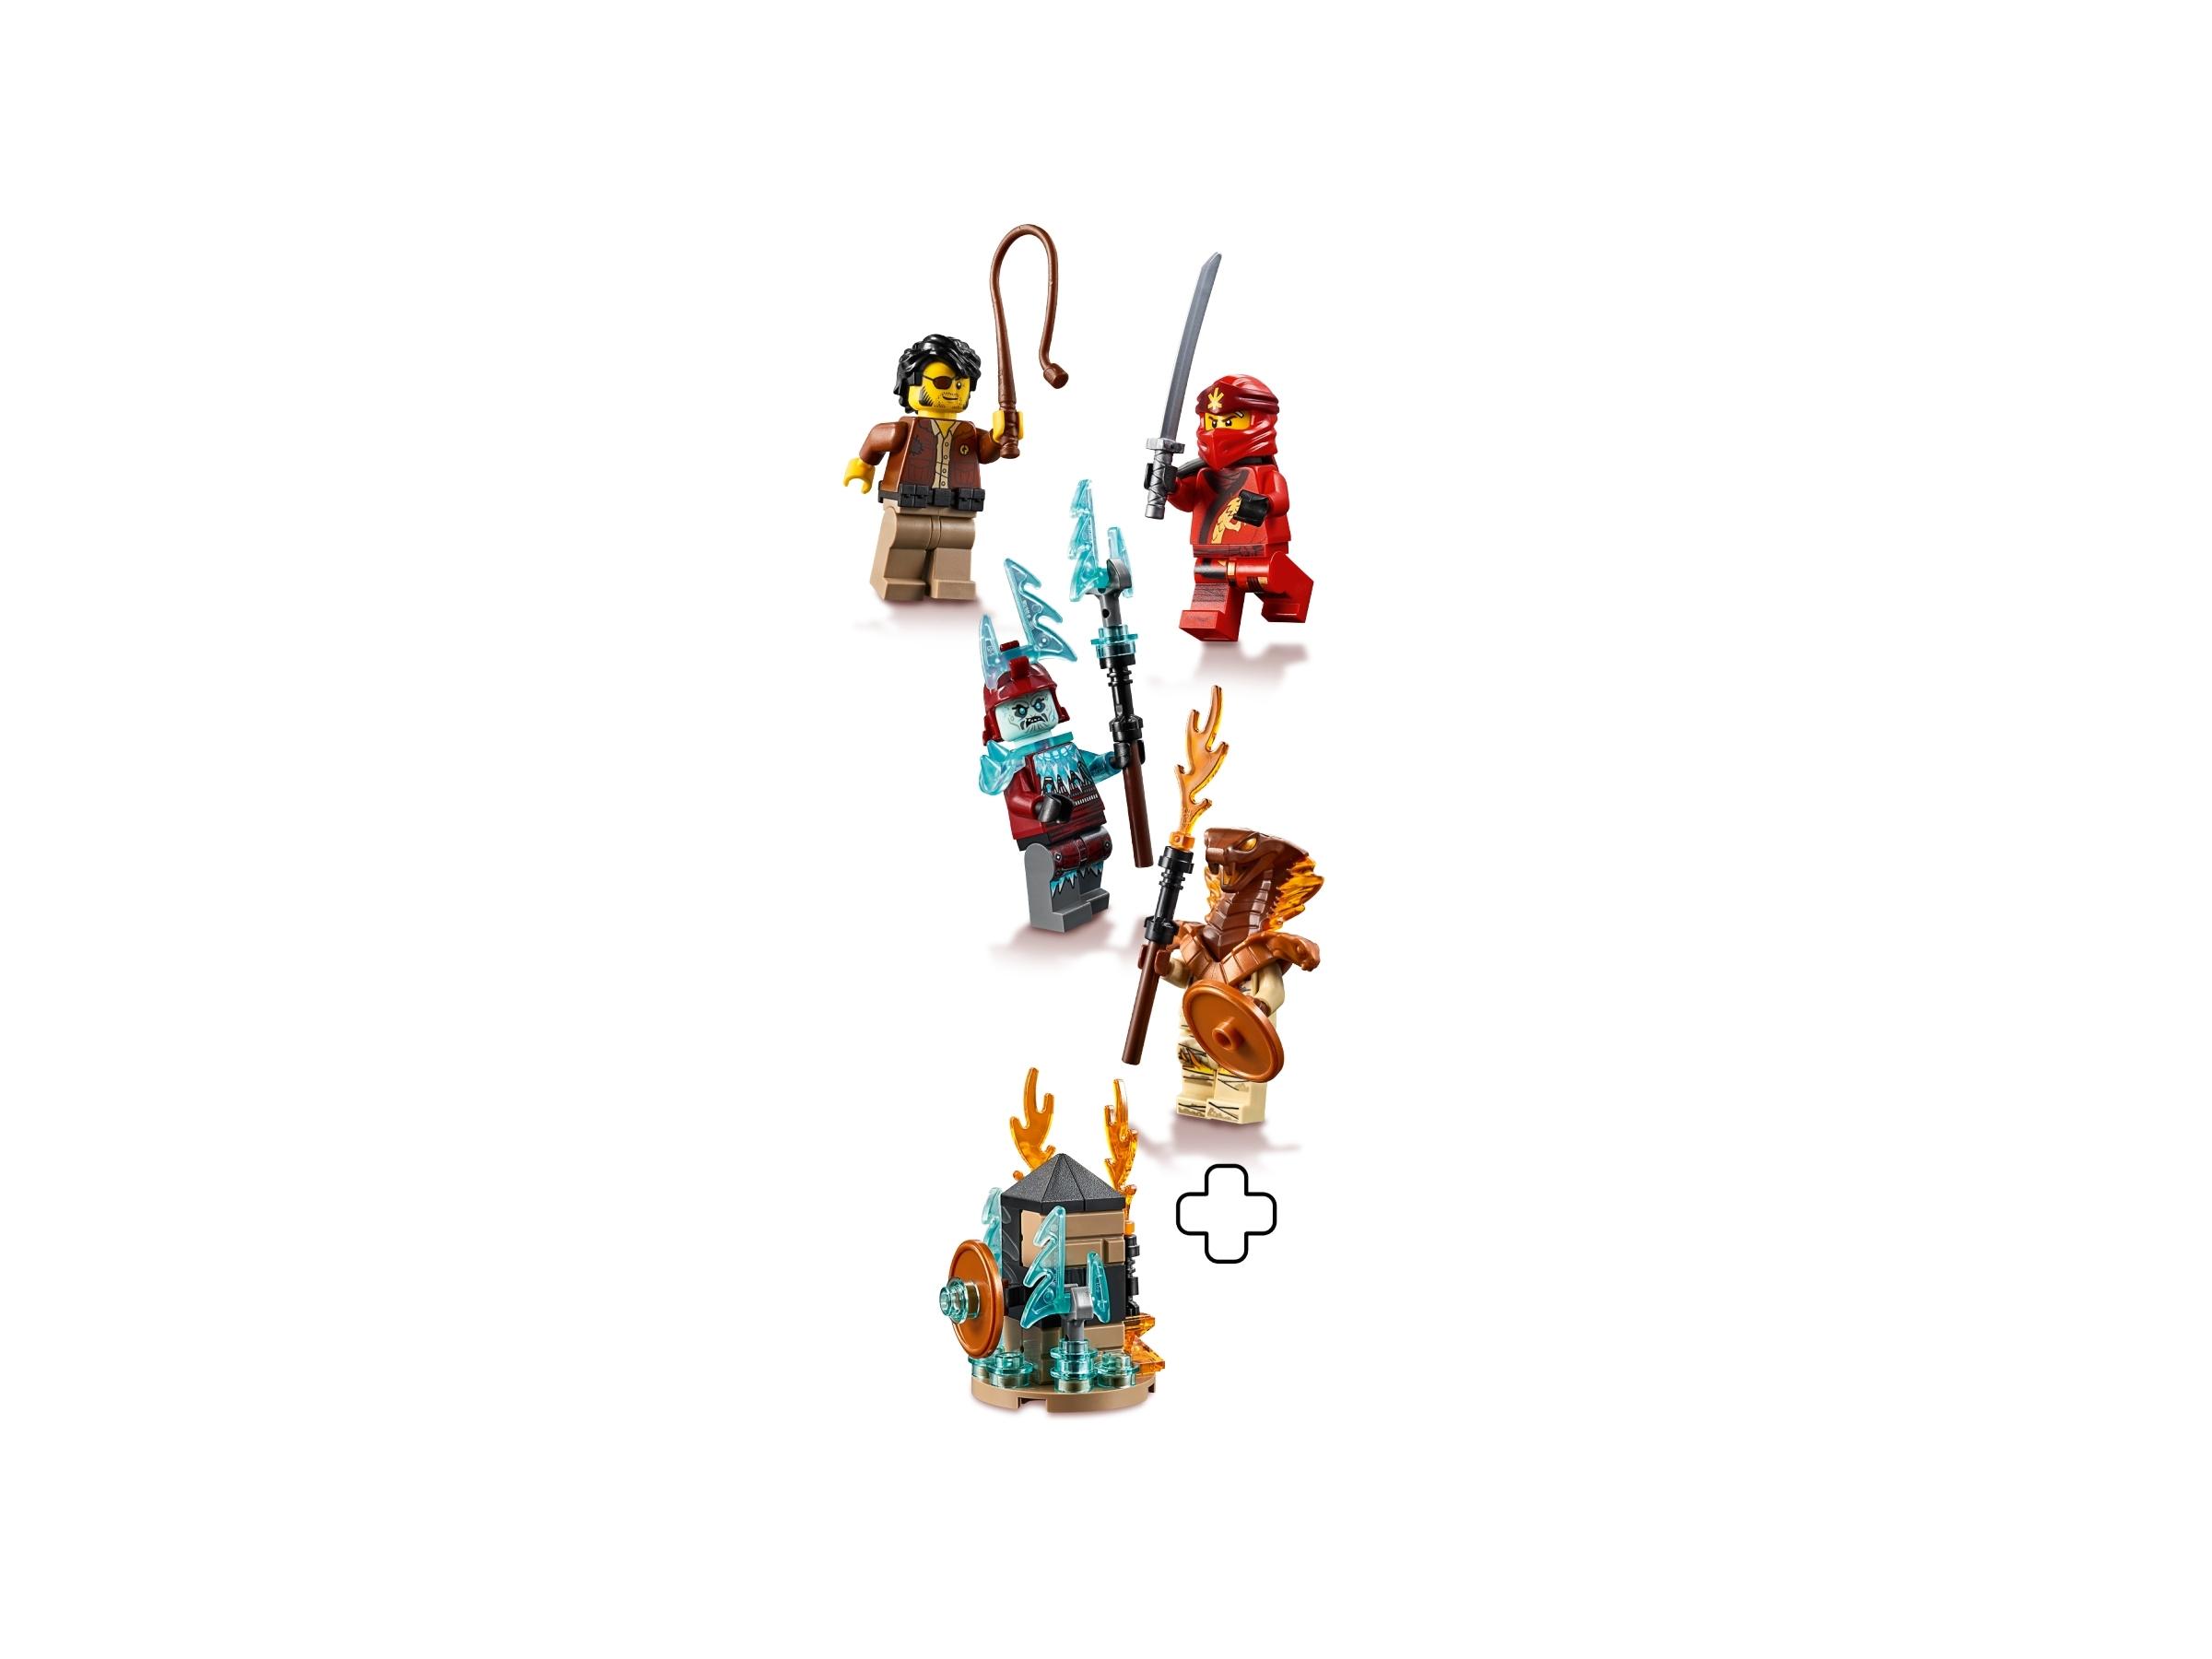 njo528 NEW LEGO Blizzard Samurai  FROM SET 40342 NINJAGO